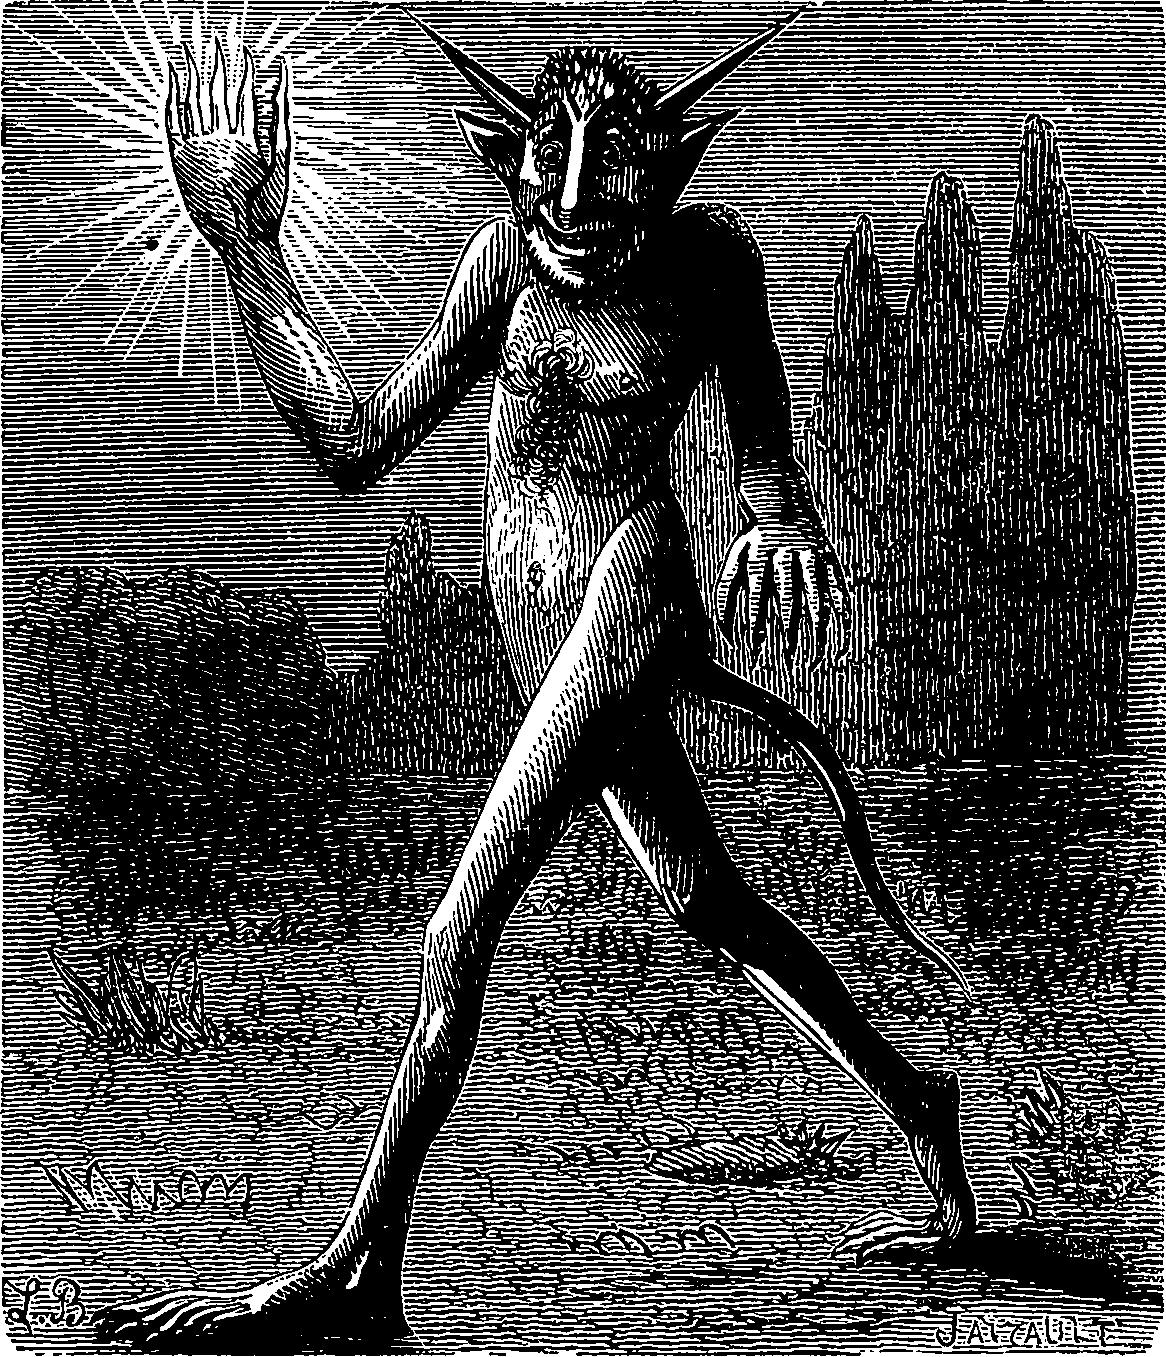 Yan-gant-y-tan - Wikipedia